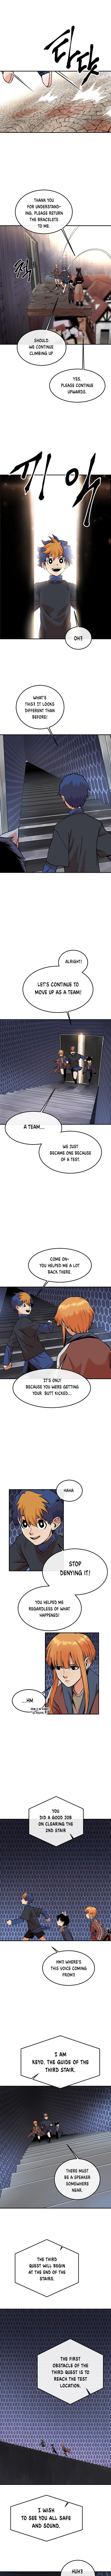 https://img3.nineanime.com/comics/pic4/8/34632/2528244/0e010fbd16cca07dc2c06d8745c0709a.jpg Page 2